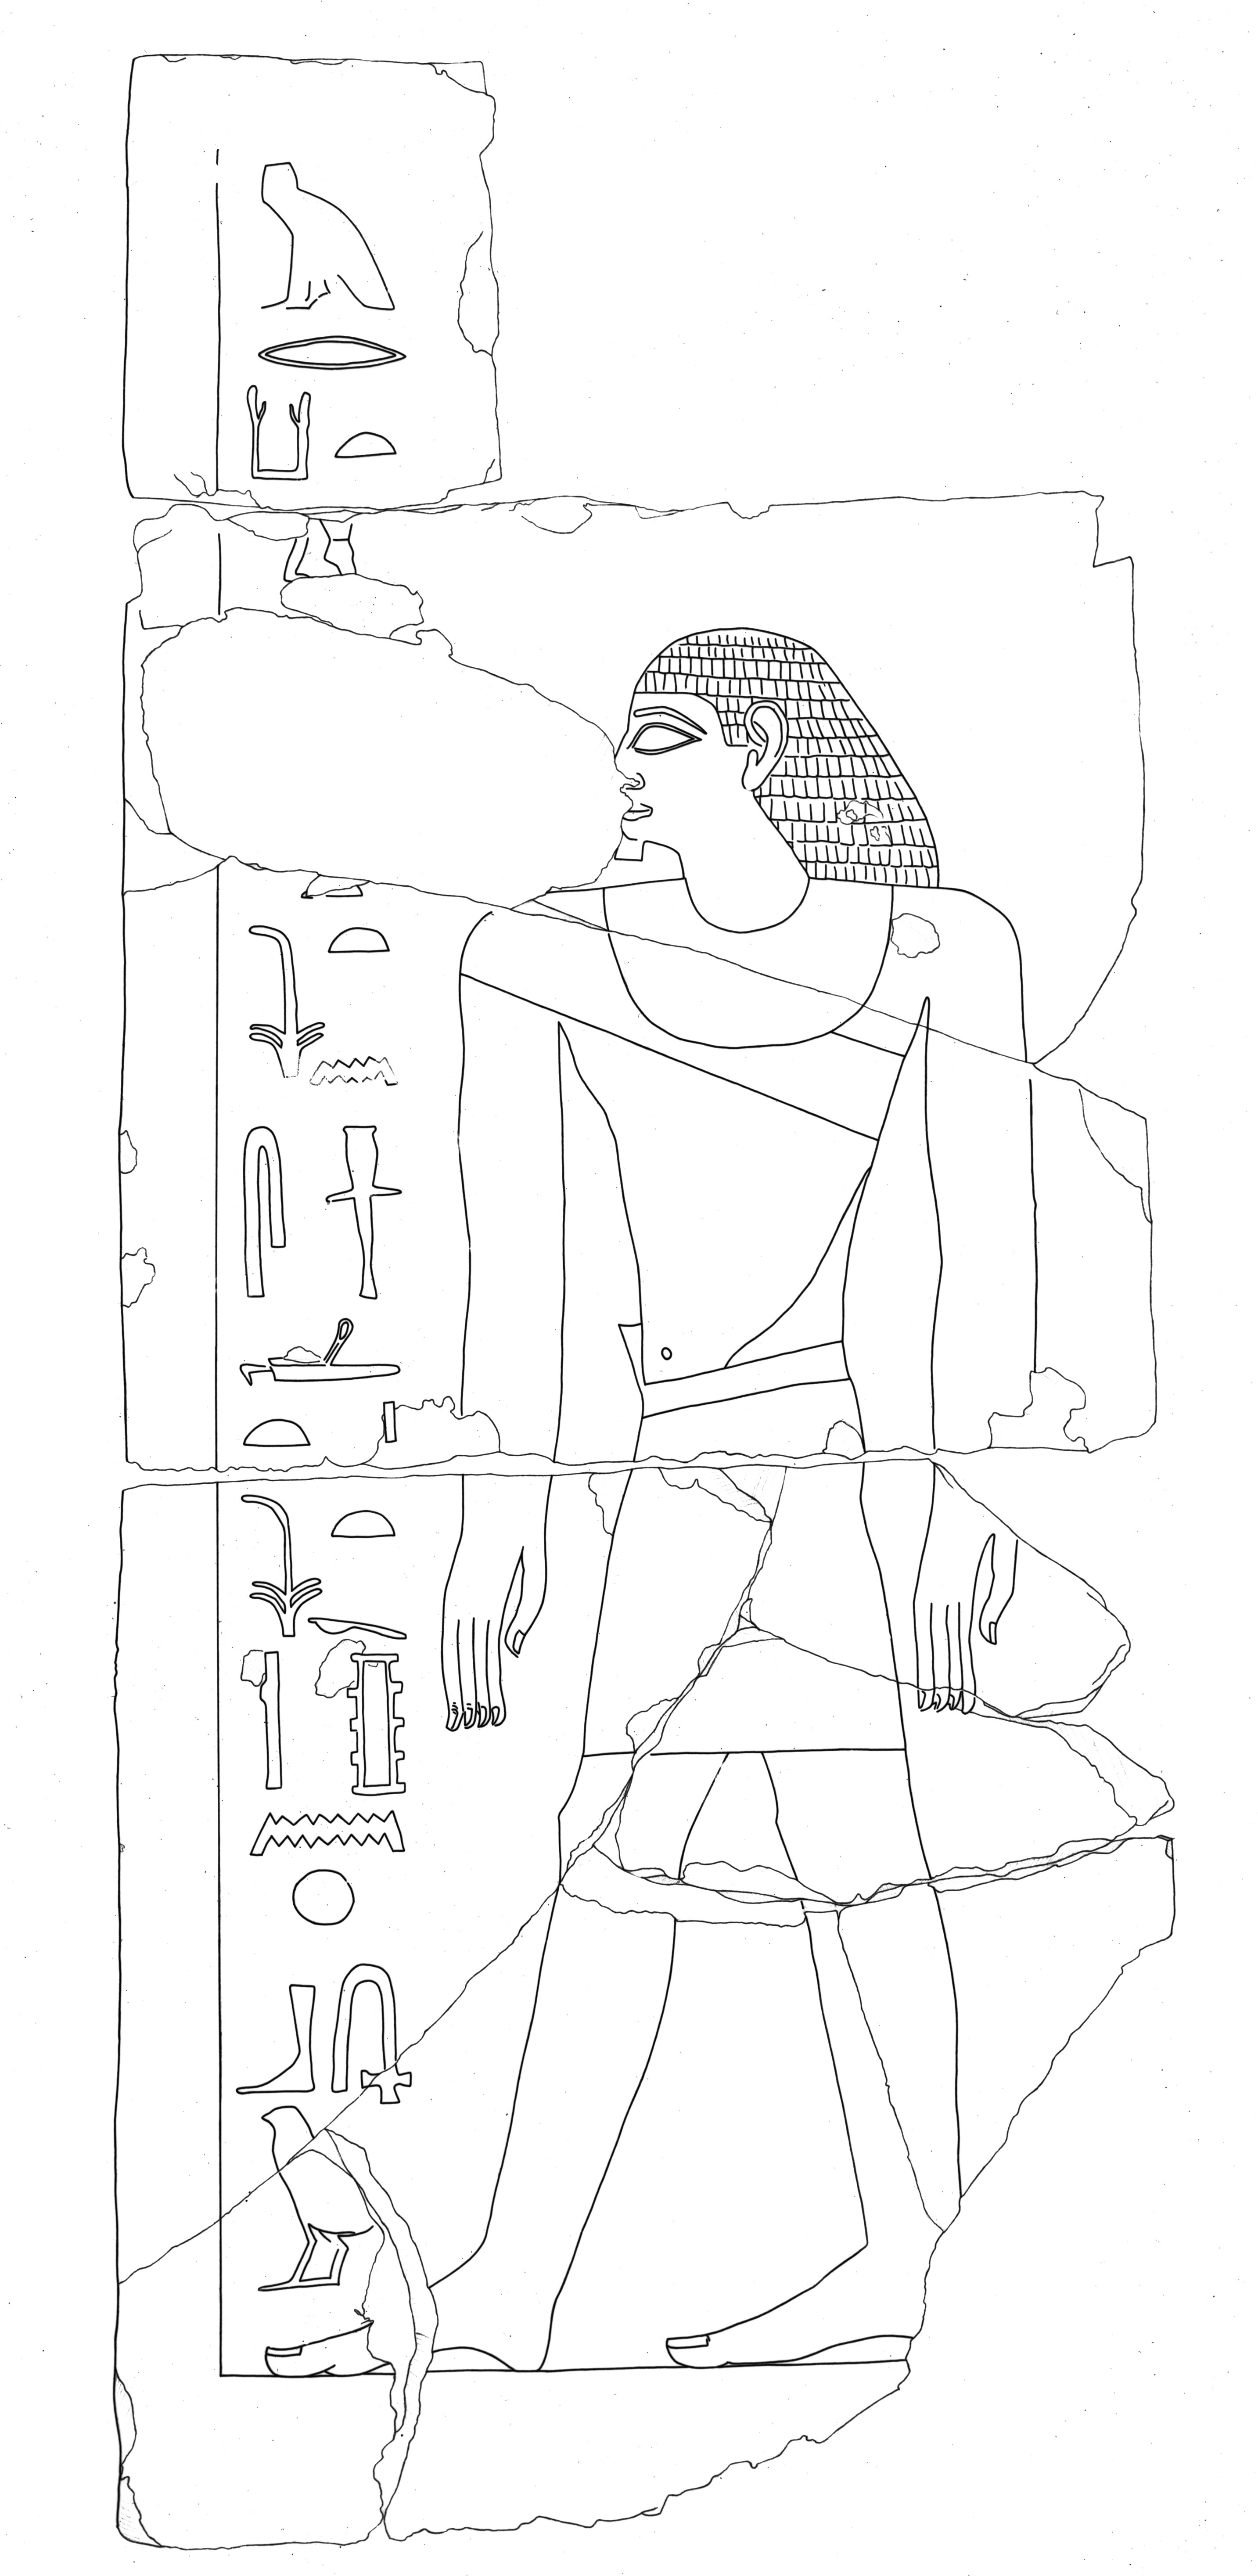 Drawings: G 2381: drawing relief from door jamb (left)